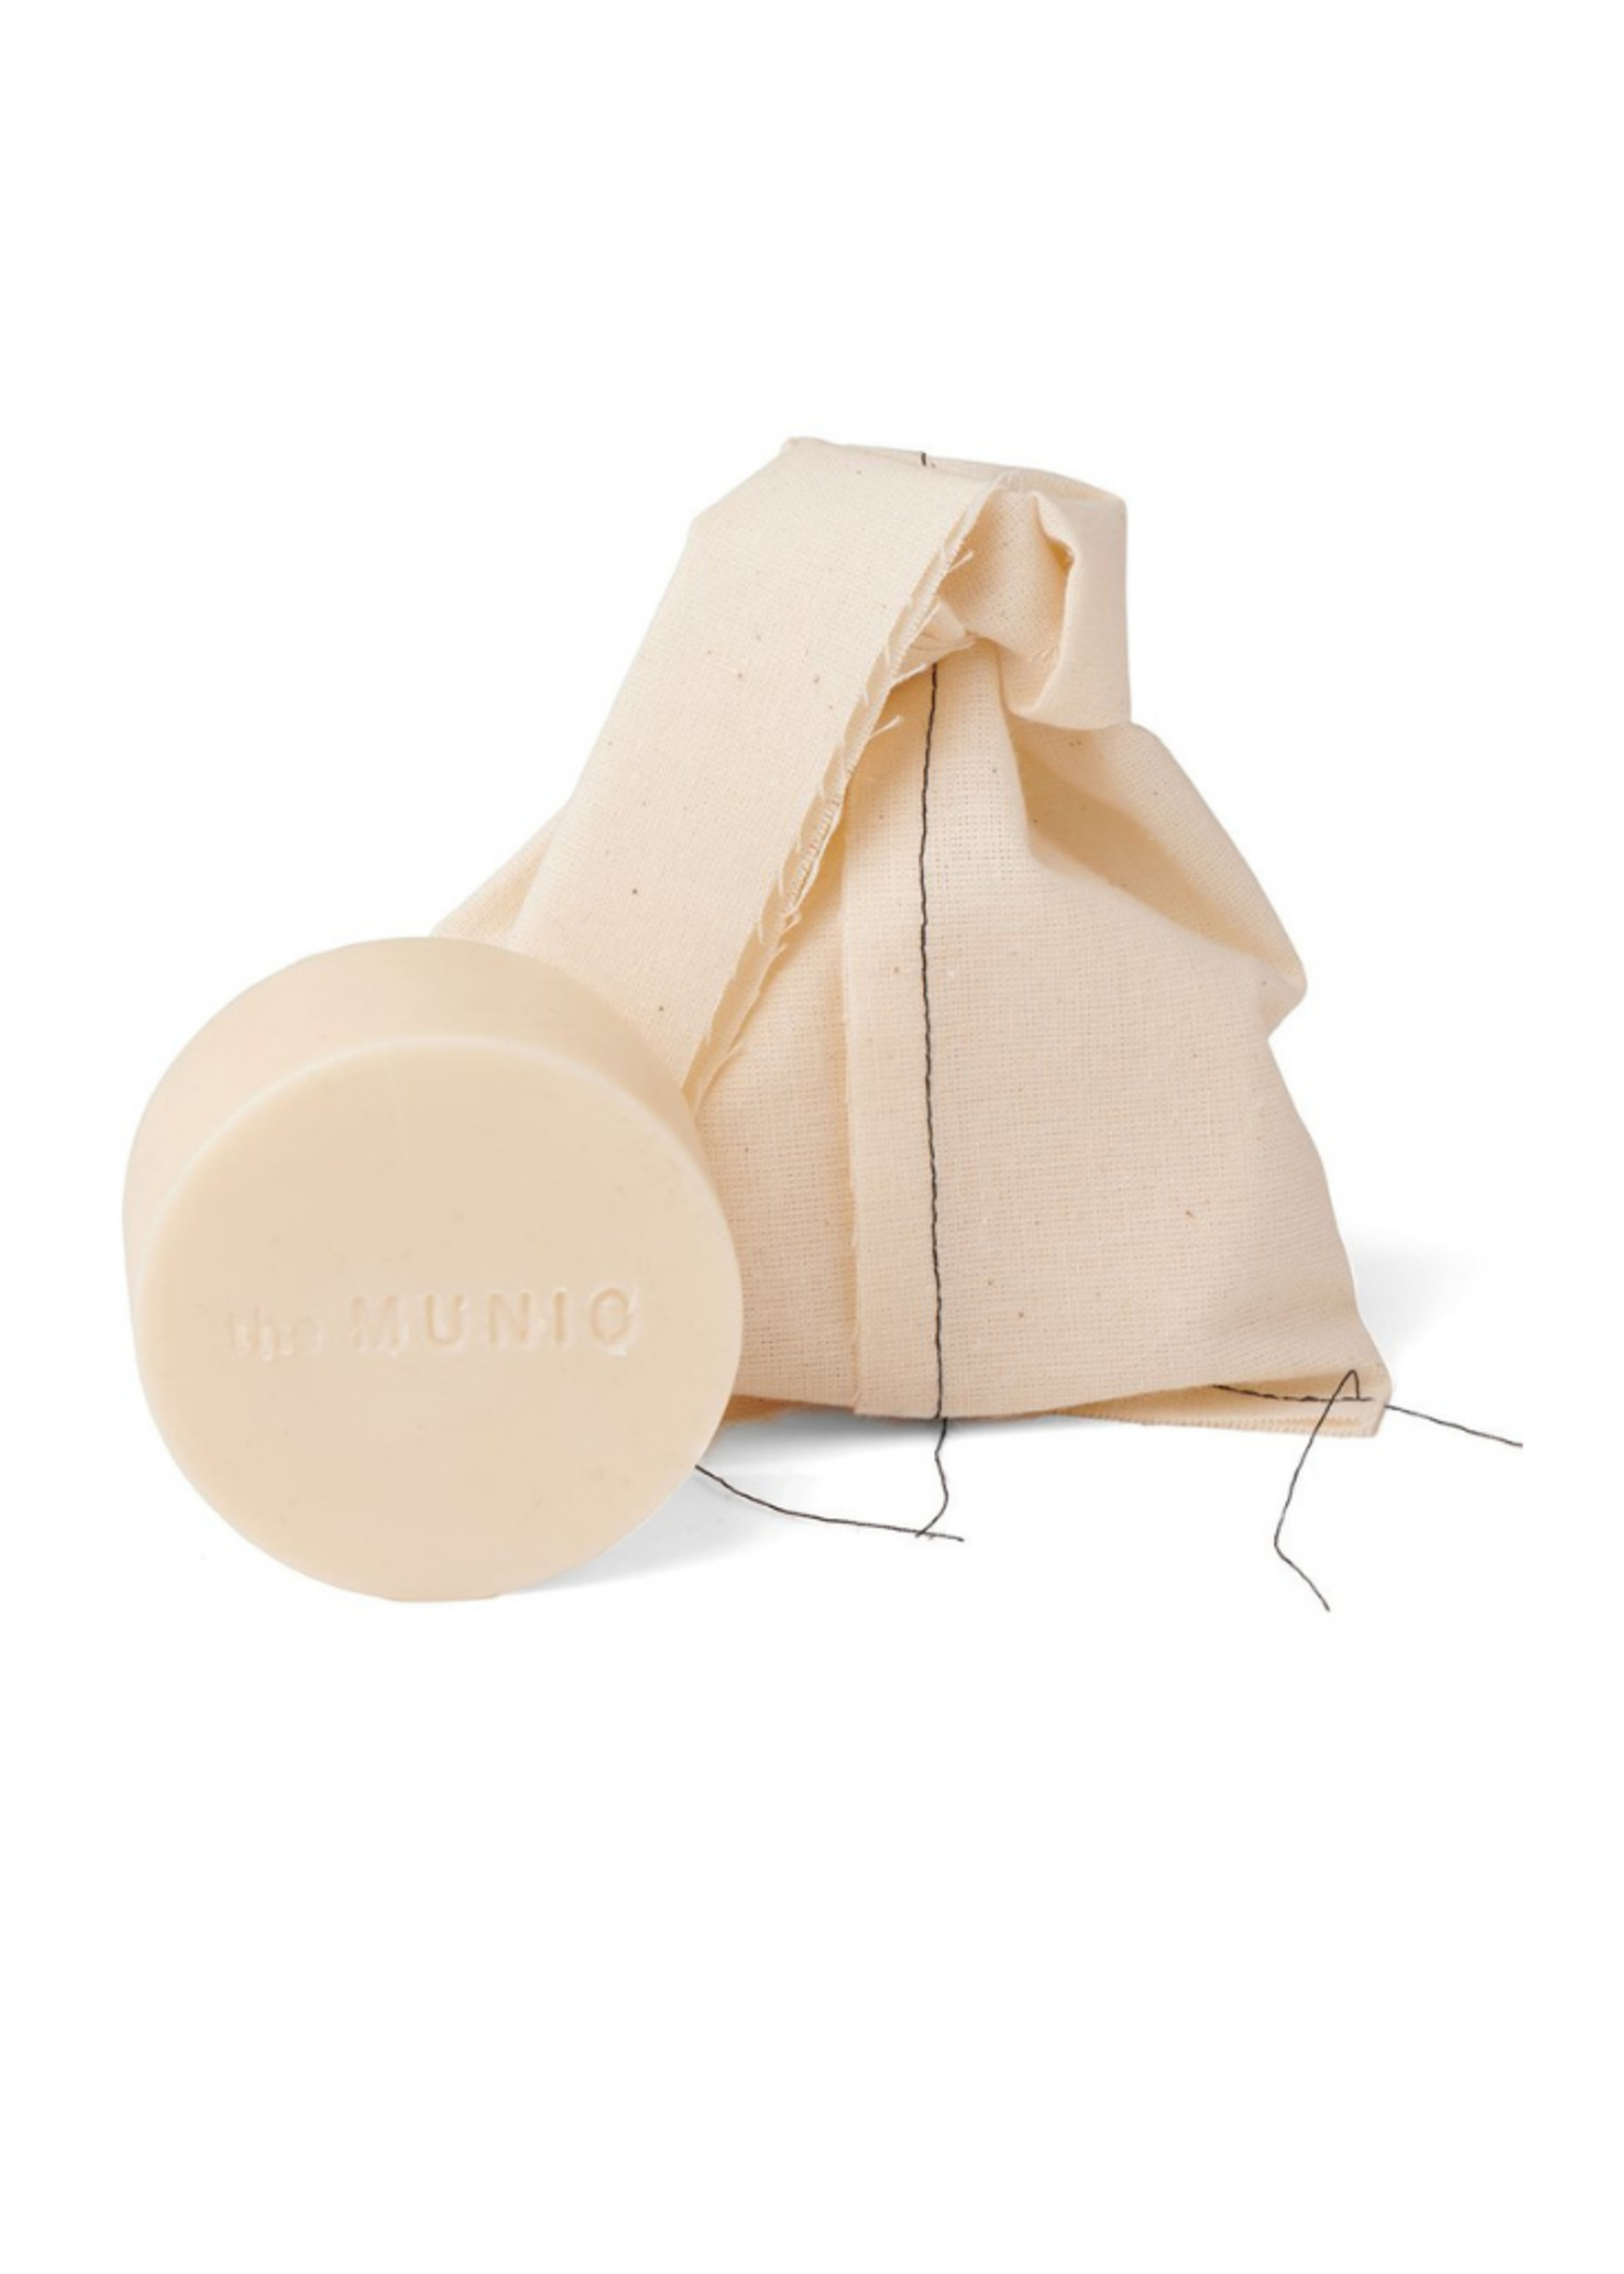 The Munio The Munio Wild Flowers Organic Bar Soap